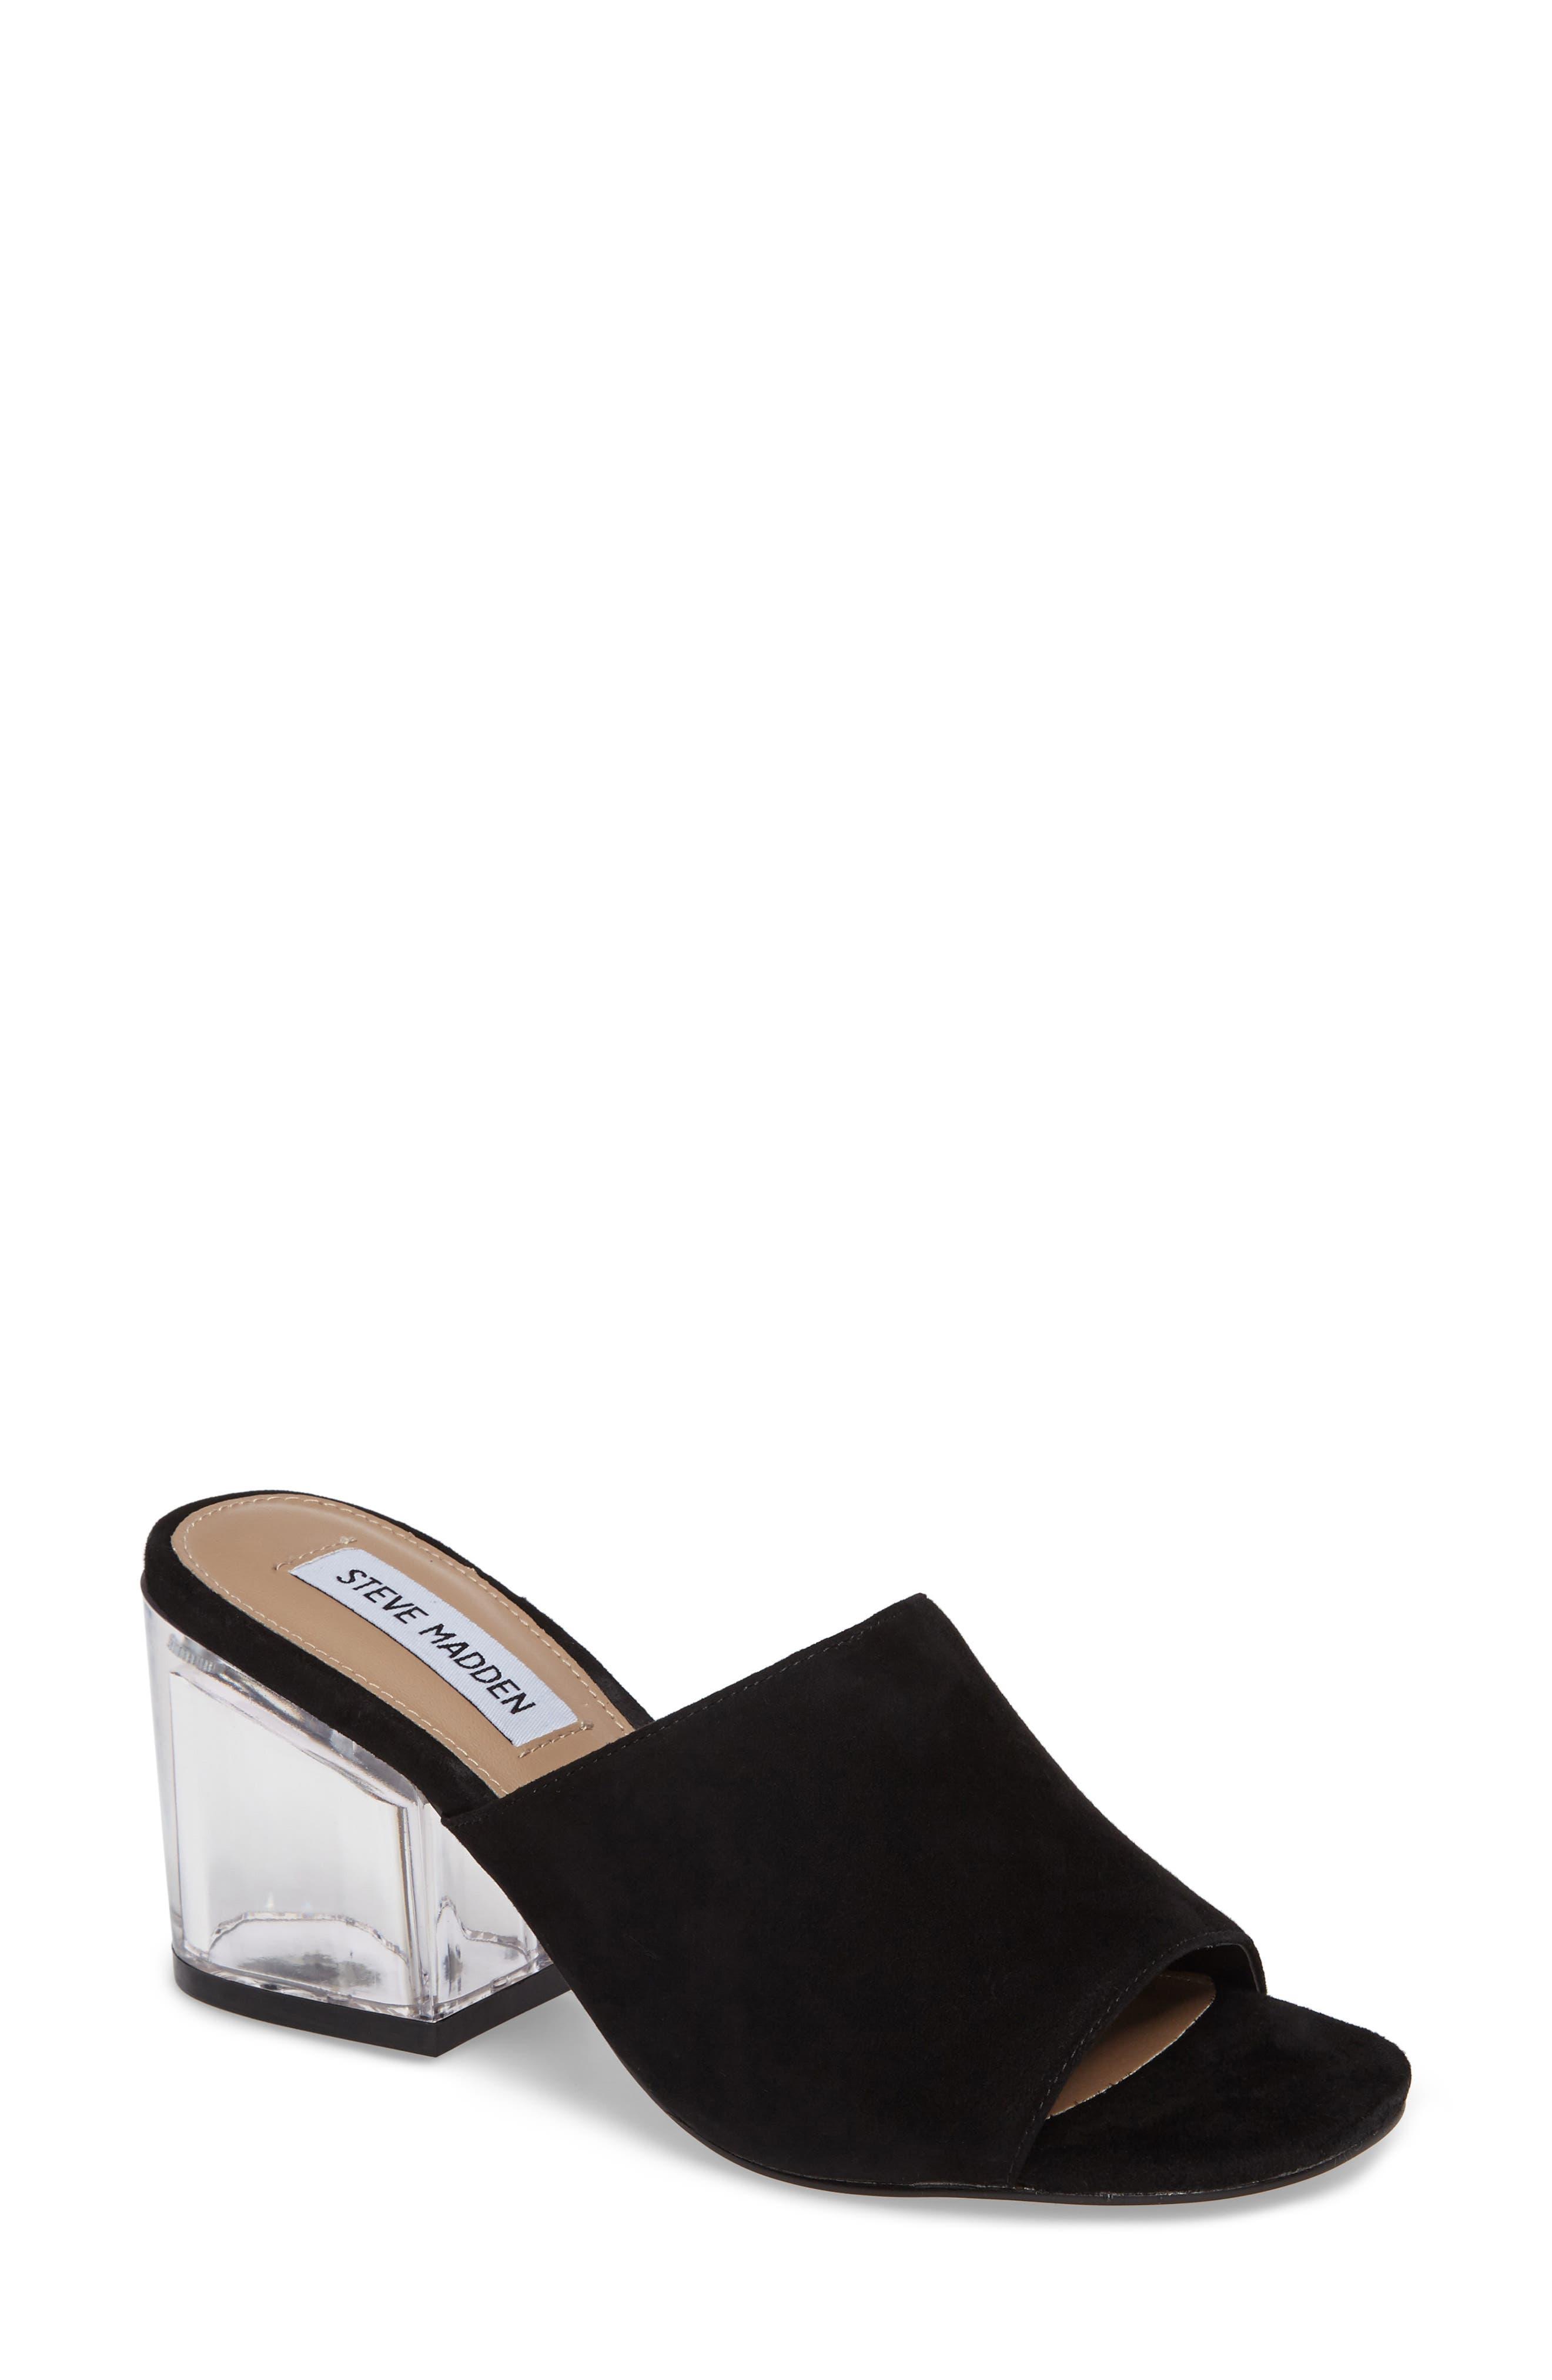 Dalis Clear Heel Slide Sandal,                             Main thumbnail 1, color,                             006